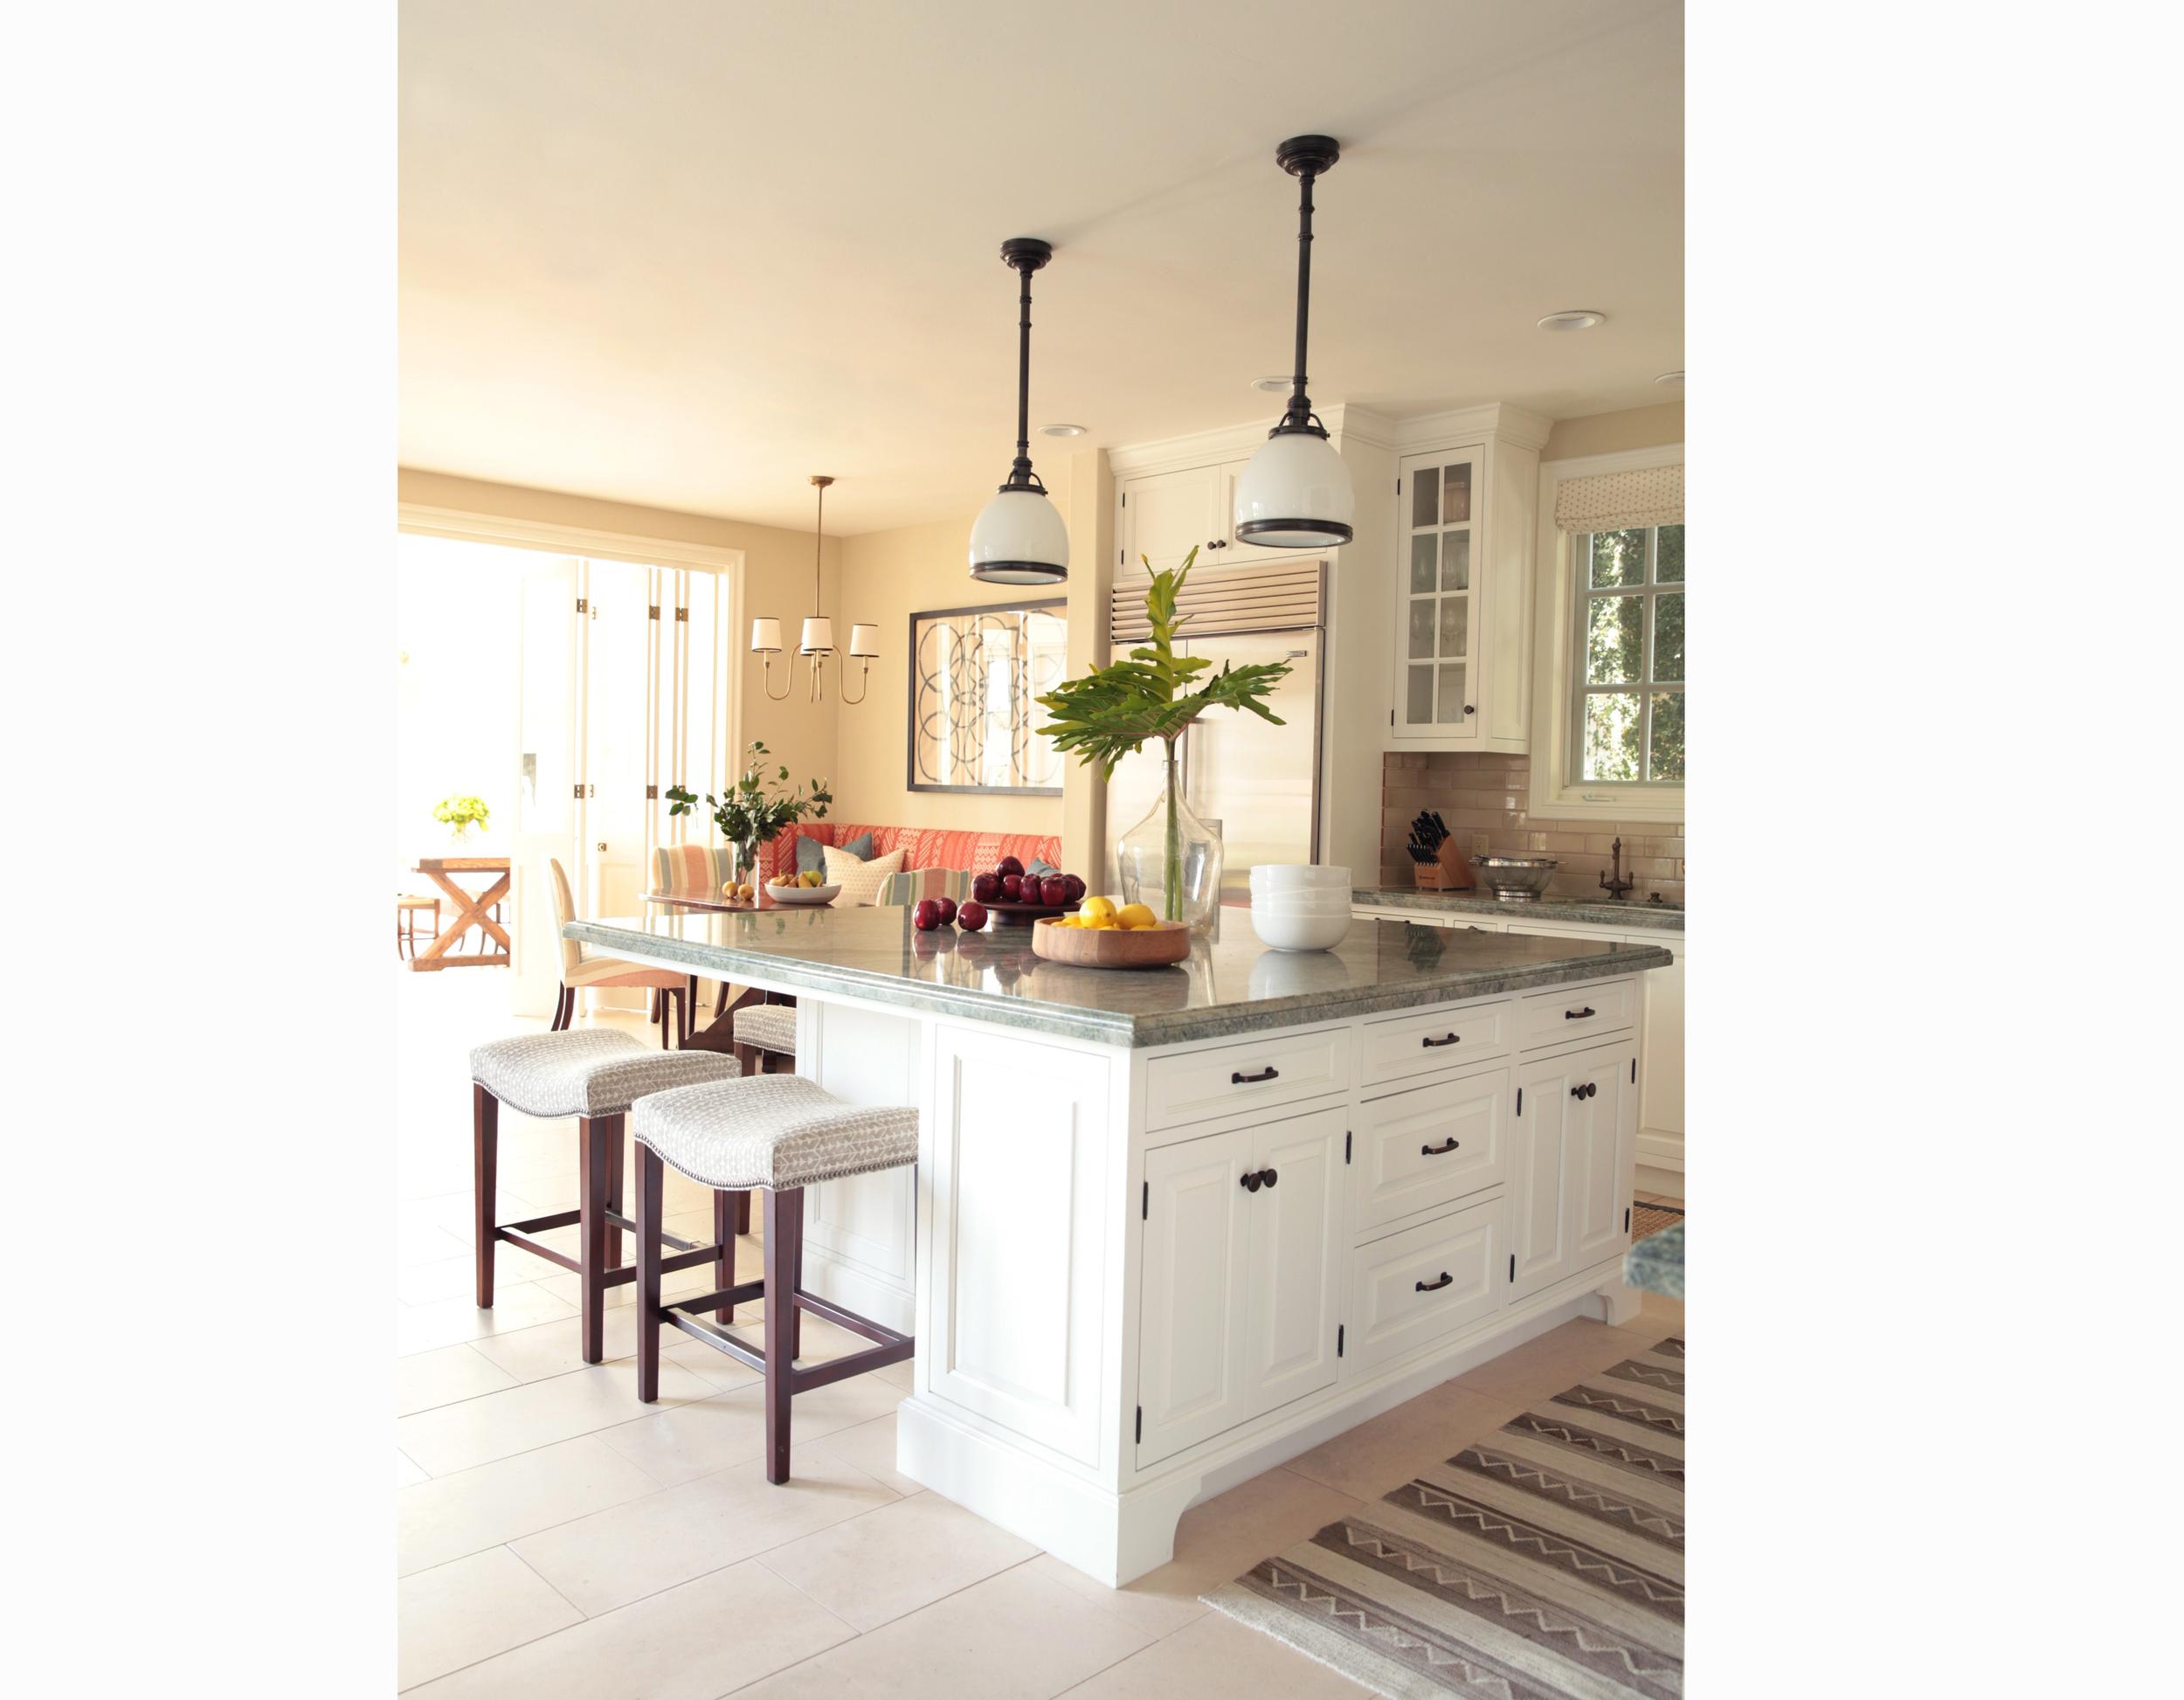 corona del mar kitchen white kitchen interior design orange county brittany stiles island.jpg